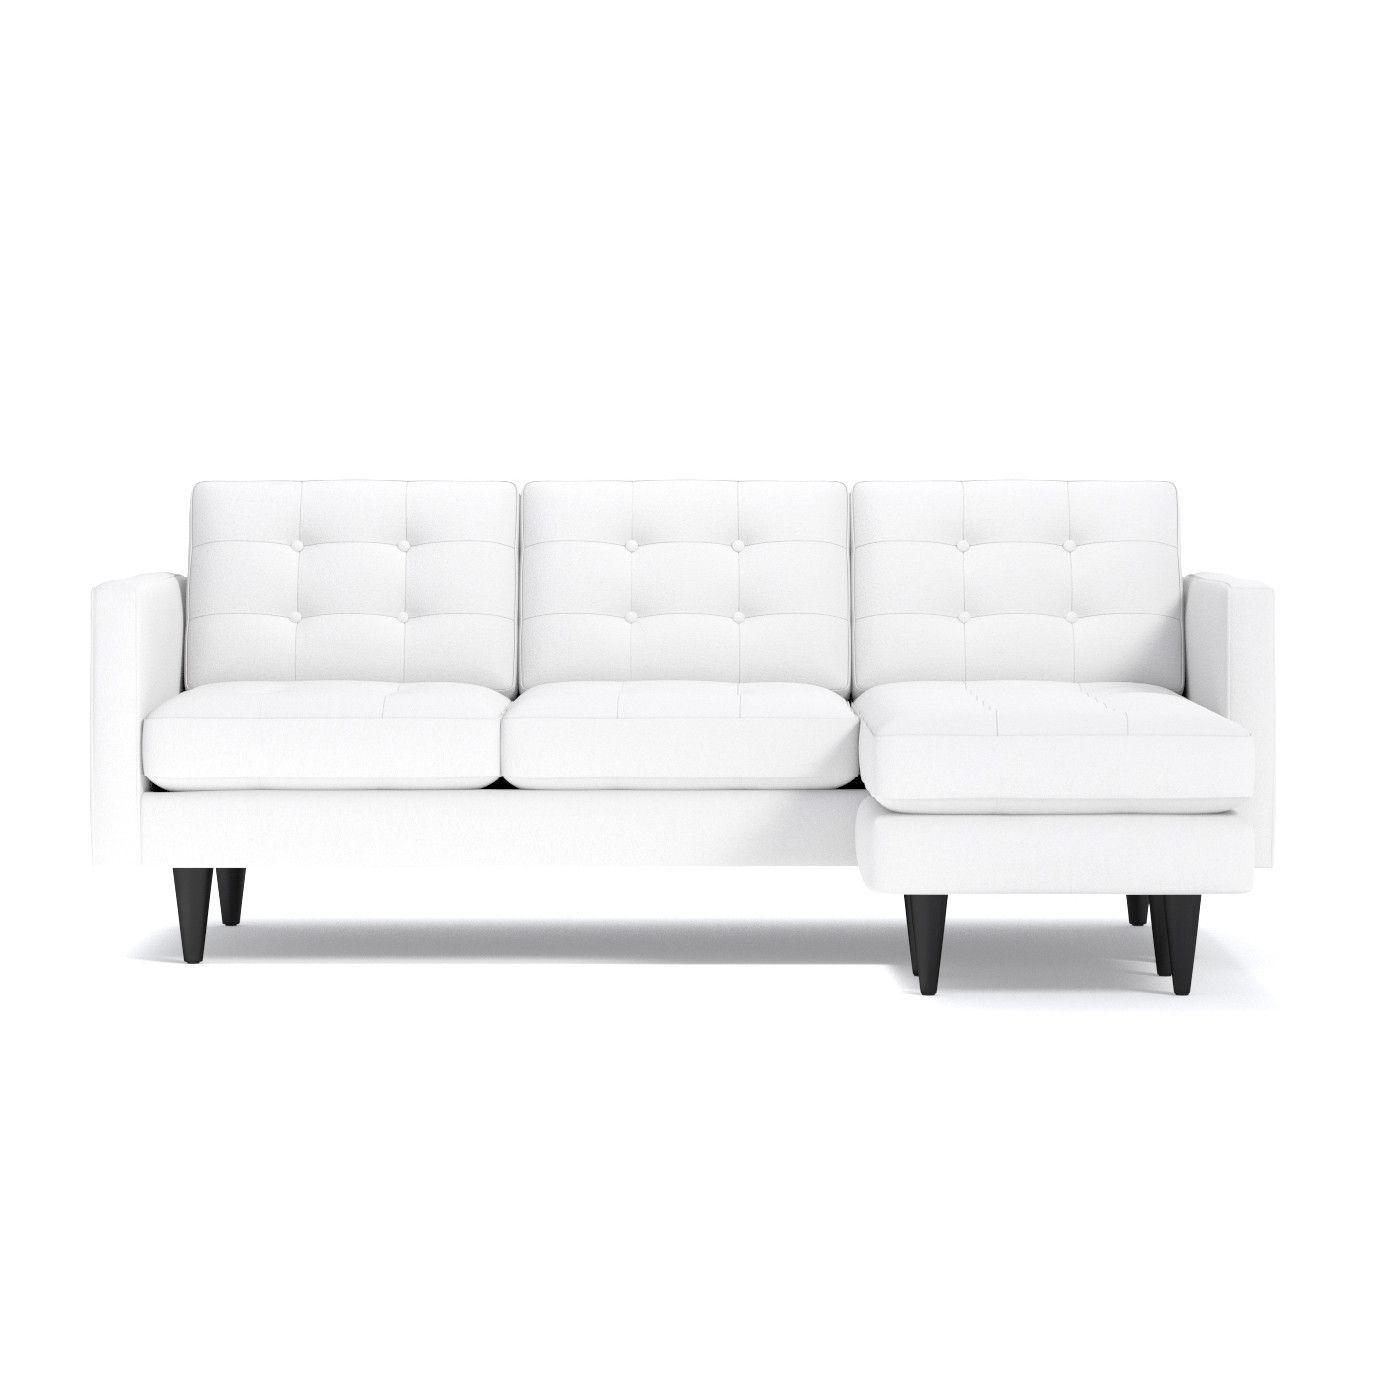 Bon Lexington Reversible Chaise Sofa